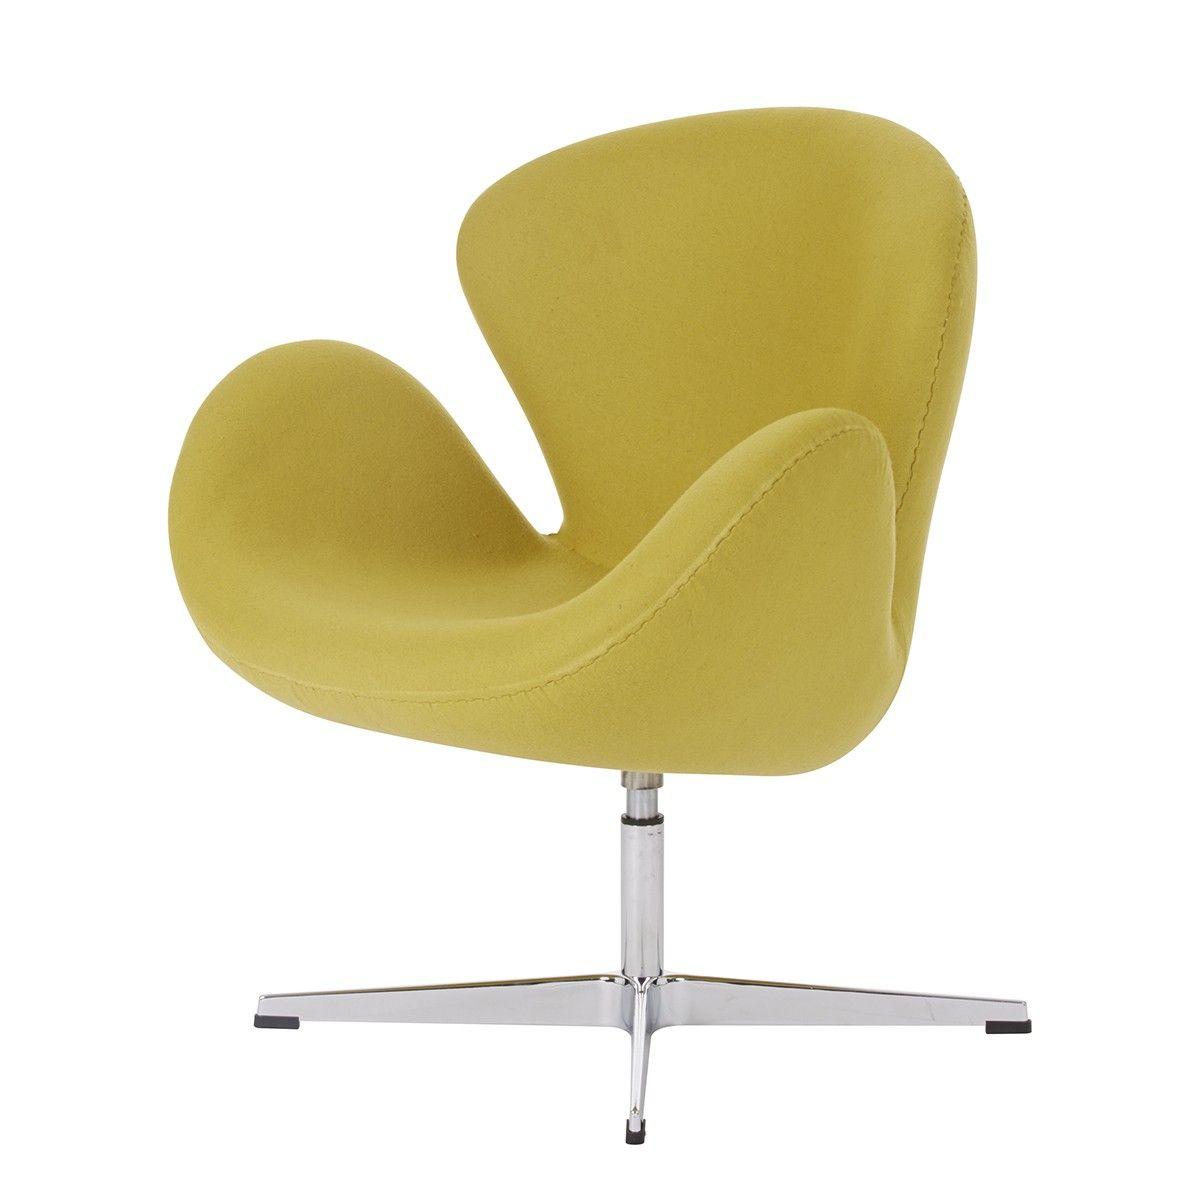 Replica Arne Jacobsen Swan Chair - Wool Blend - Chairs Nick Scali Online